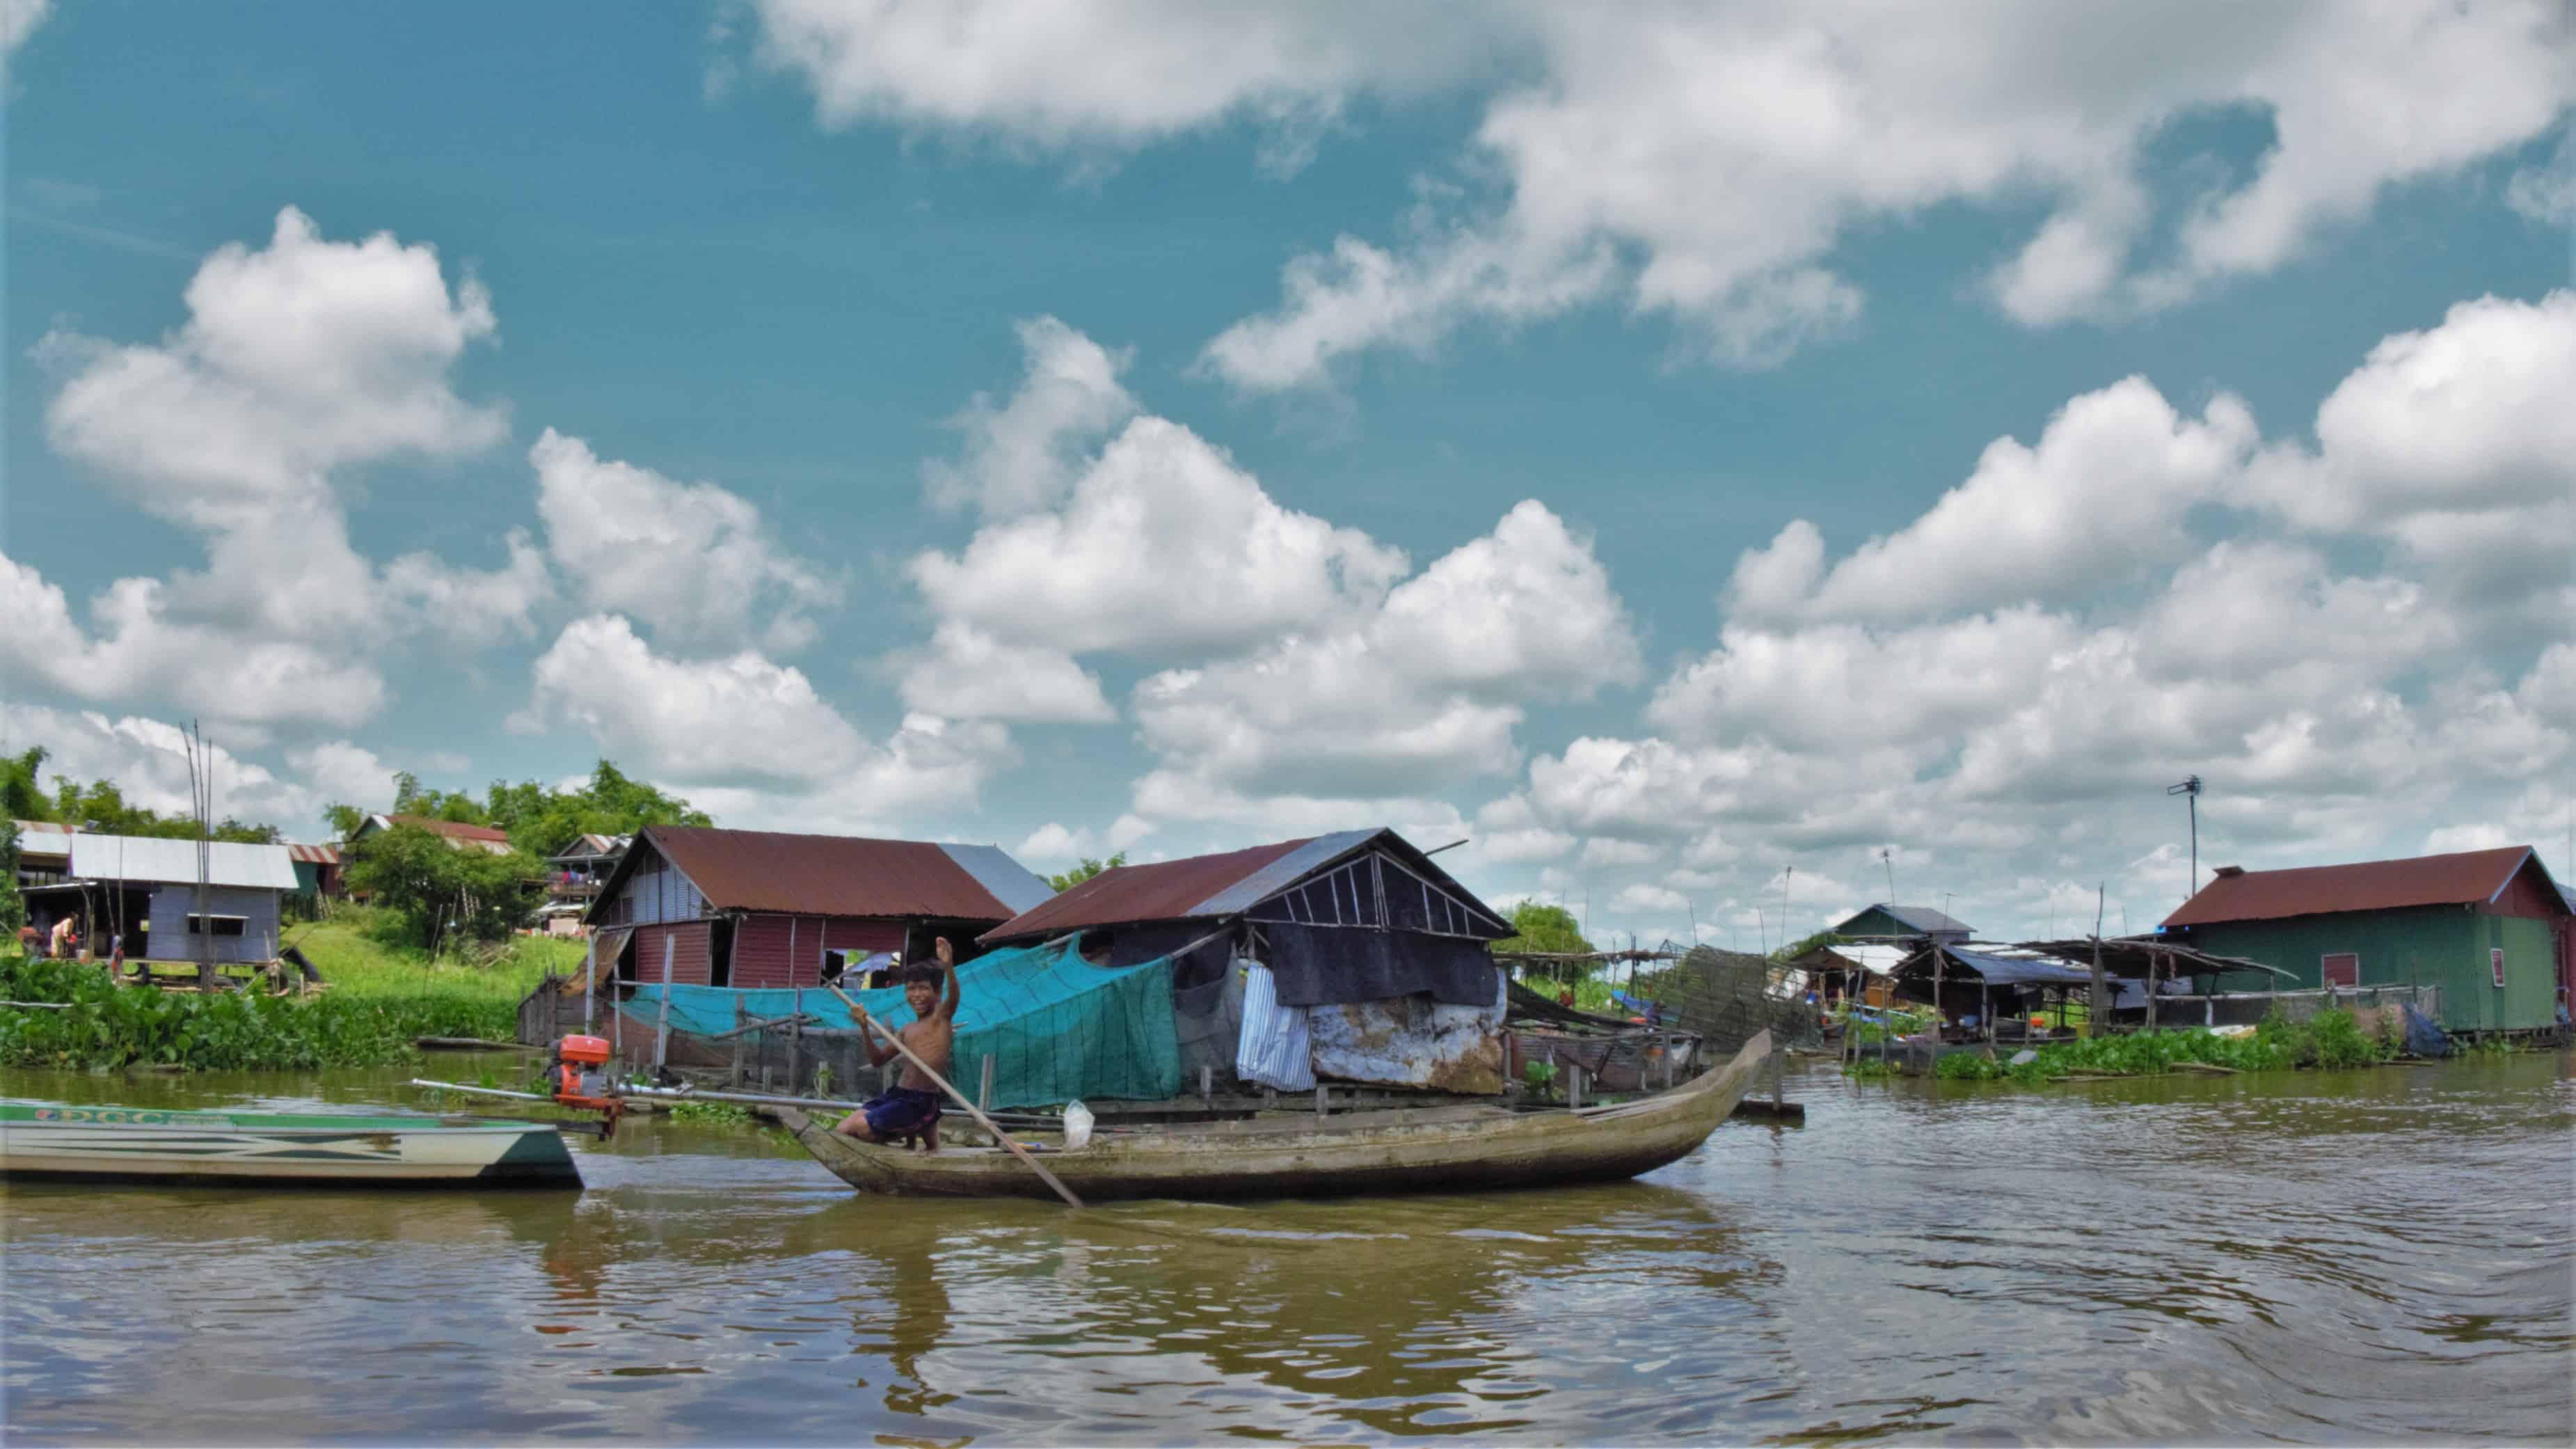 rejs do Siem Reap, Kambodża